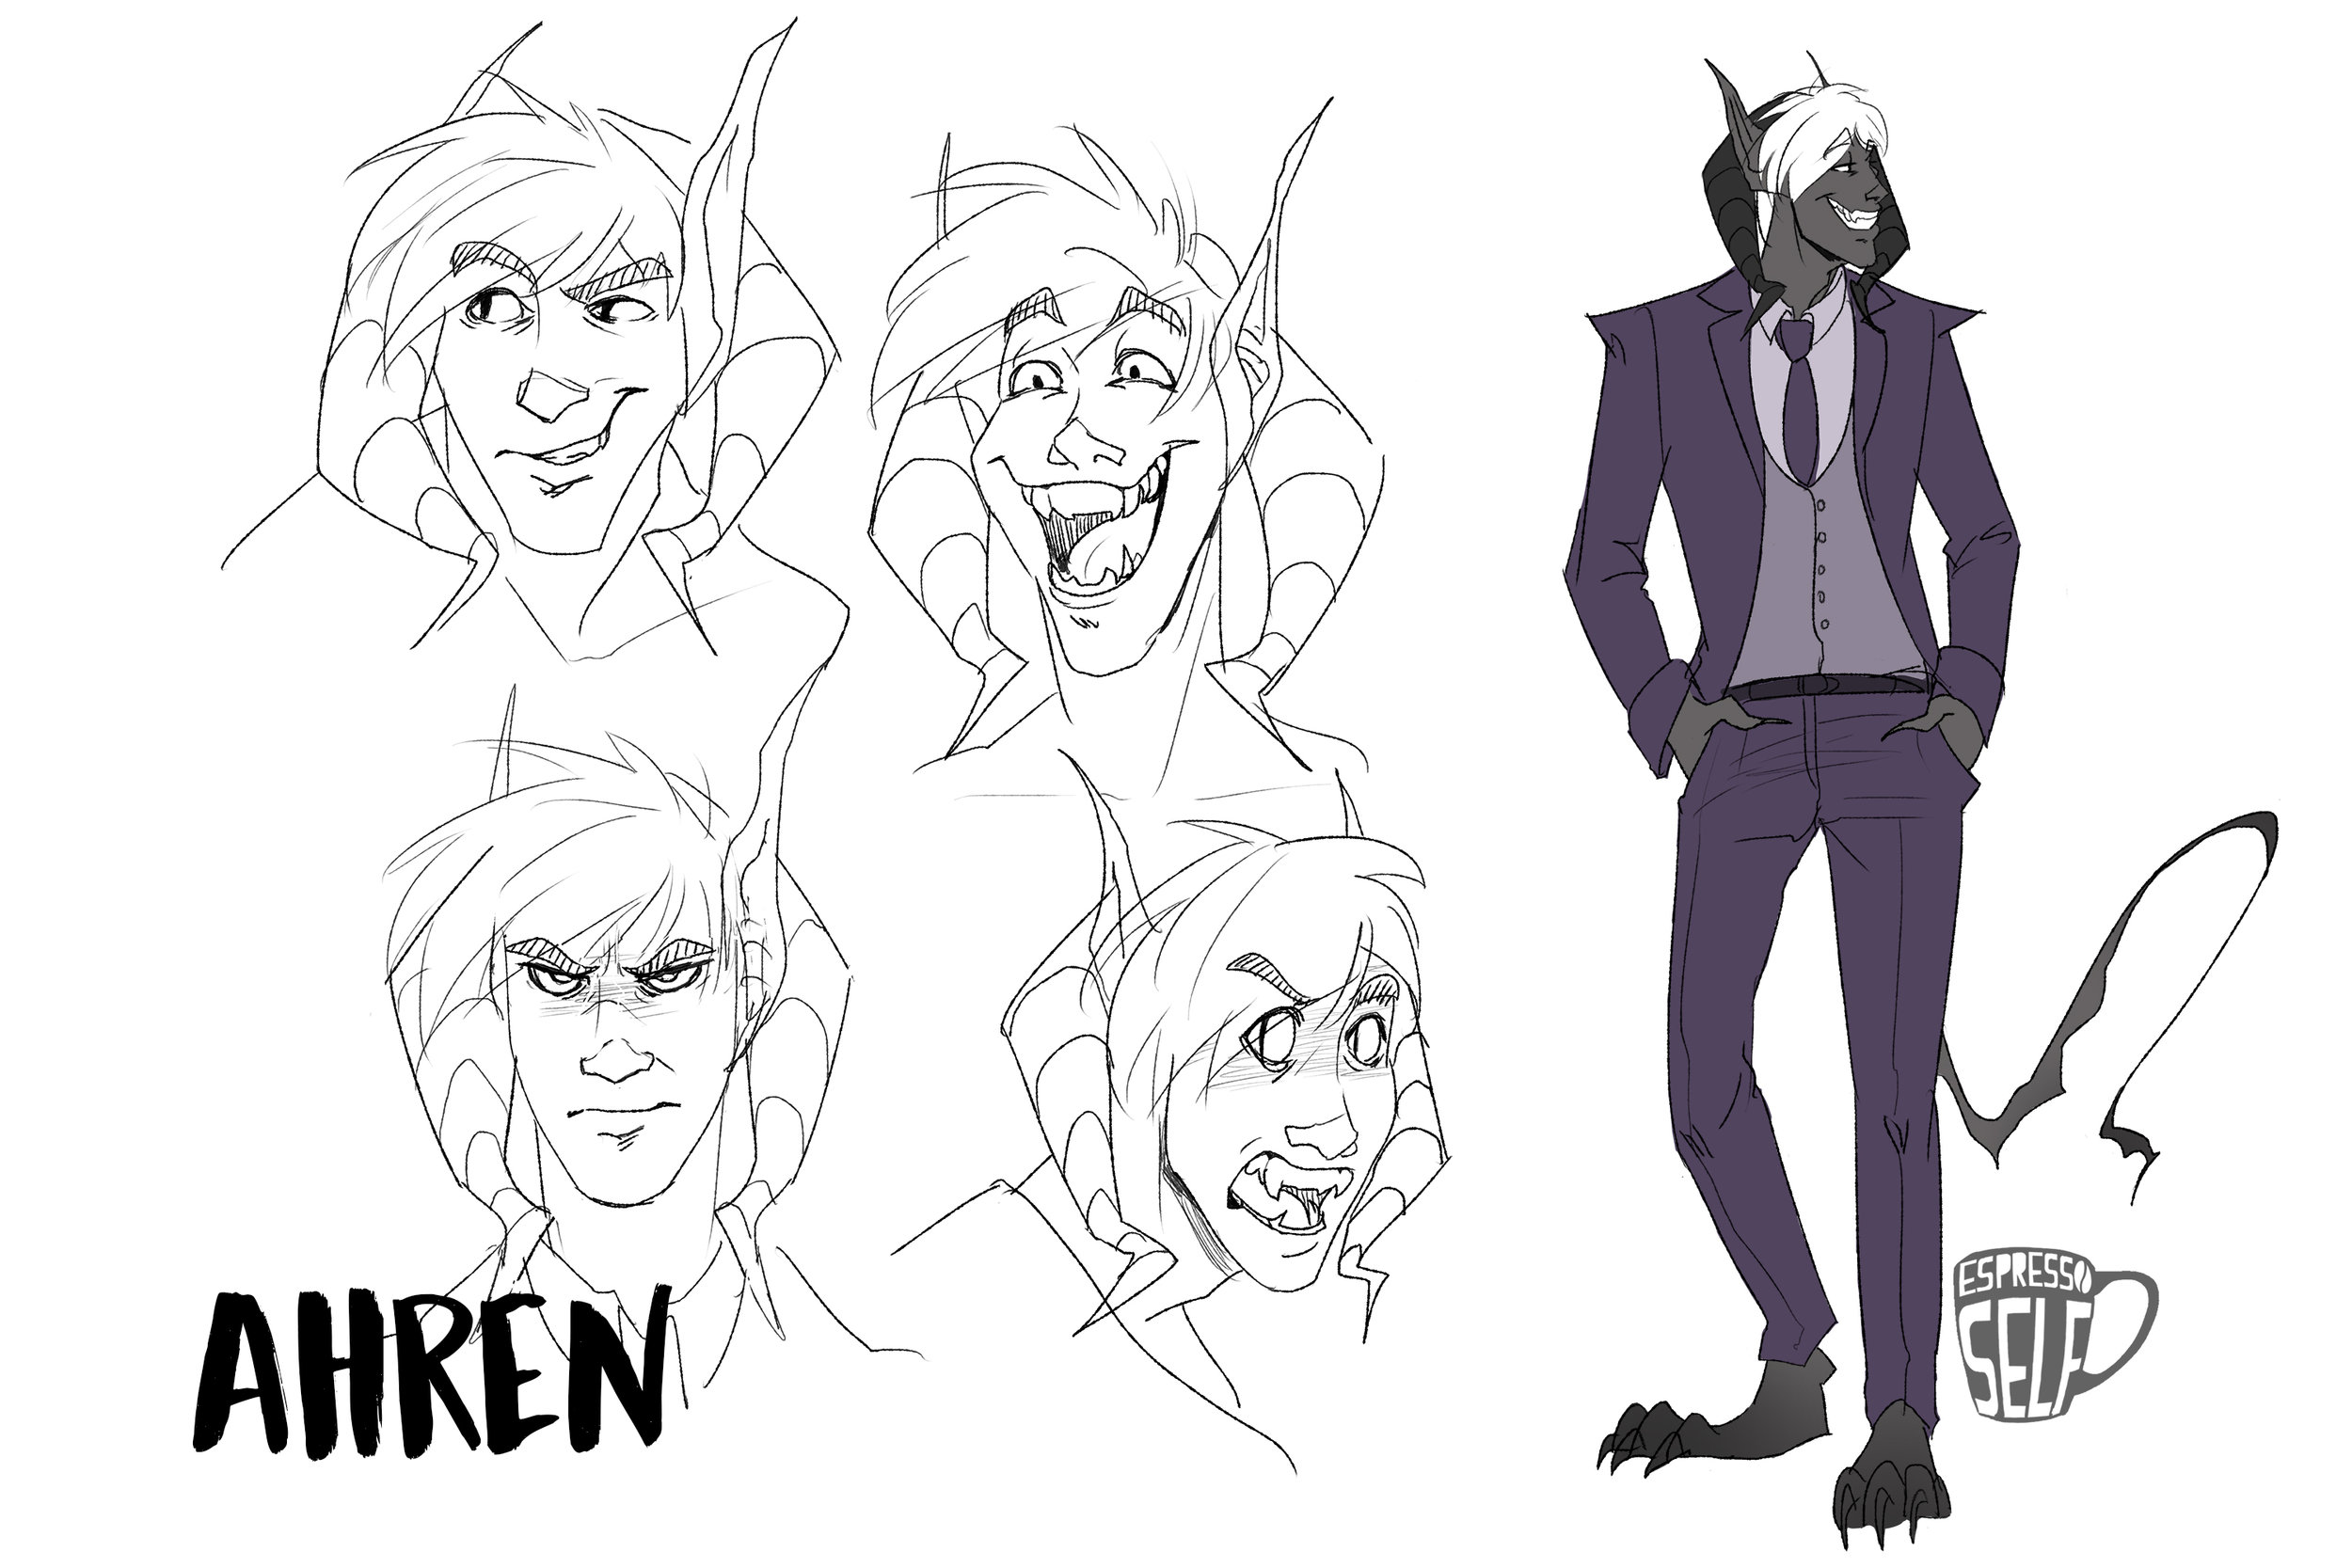 Ahren_Character_Expressions_100dpi.jpg